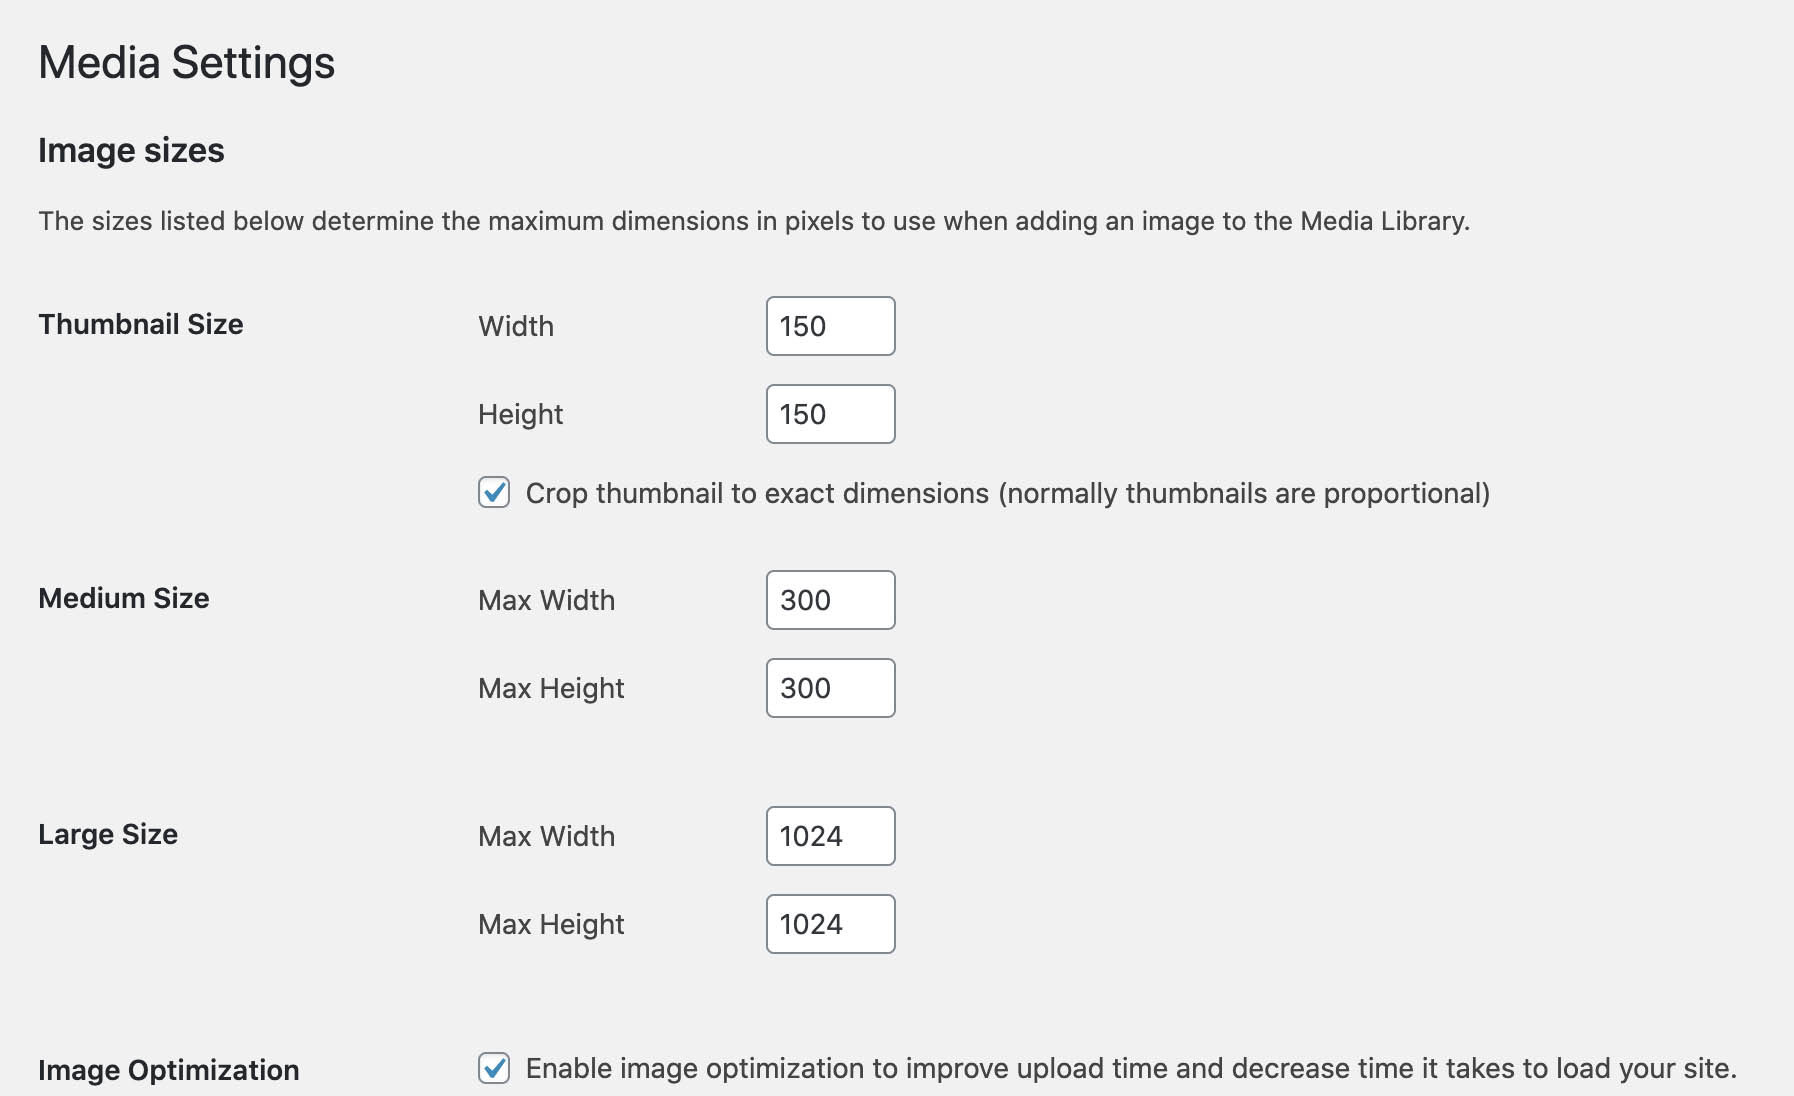 Media settings in Journal